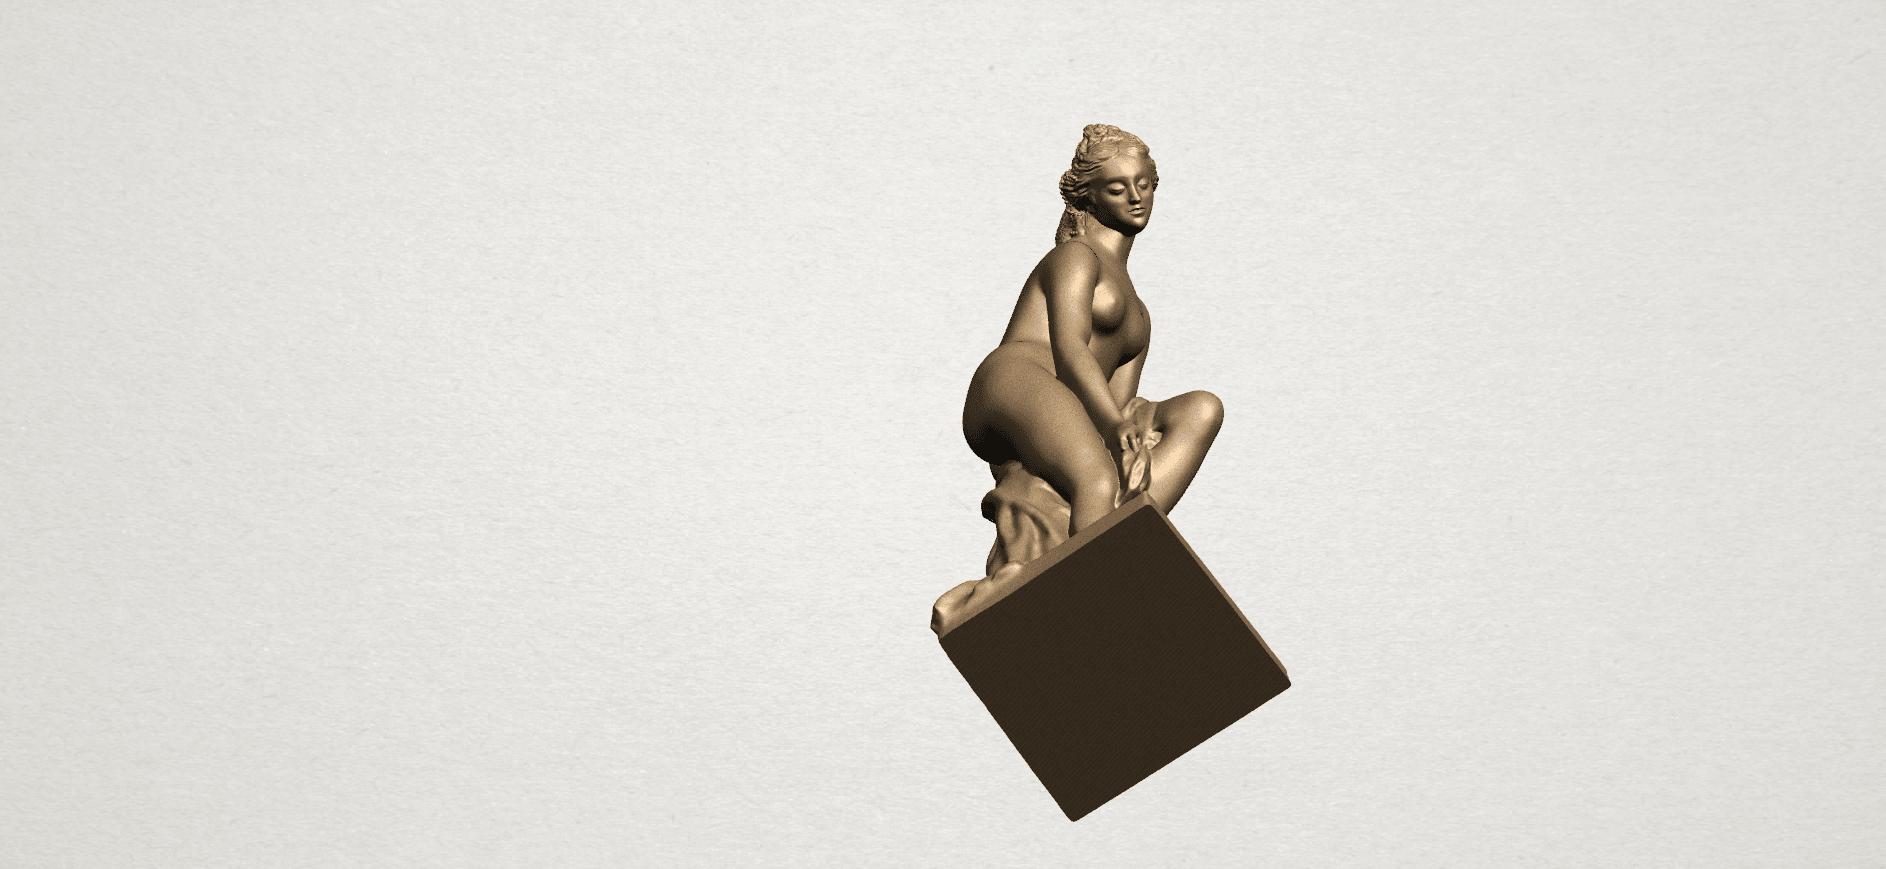 Naked Girl (iv) A08.png Download free STL file Naked Girl 04 • 3D print design, GeorgesNikkei